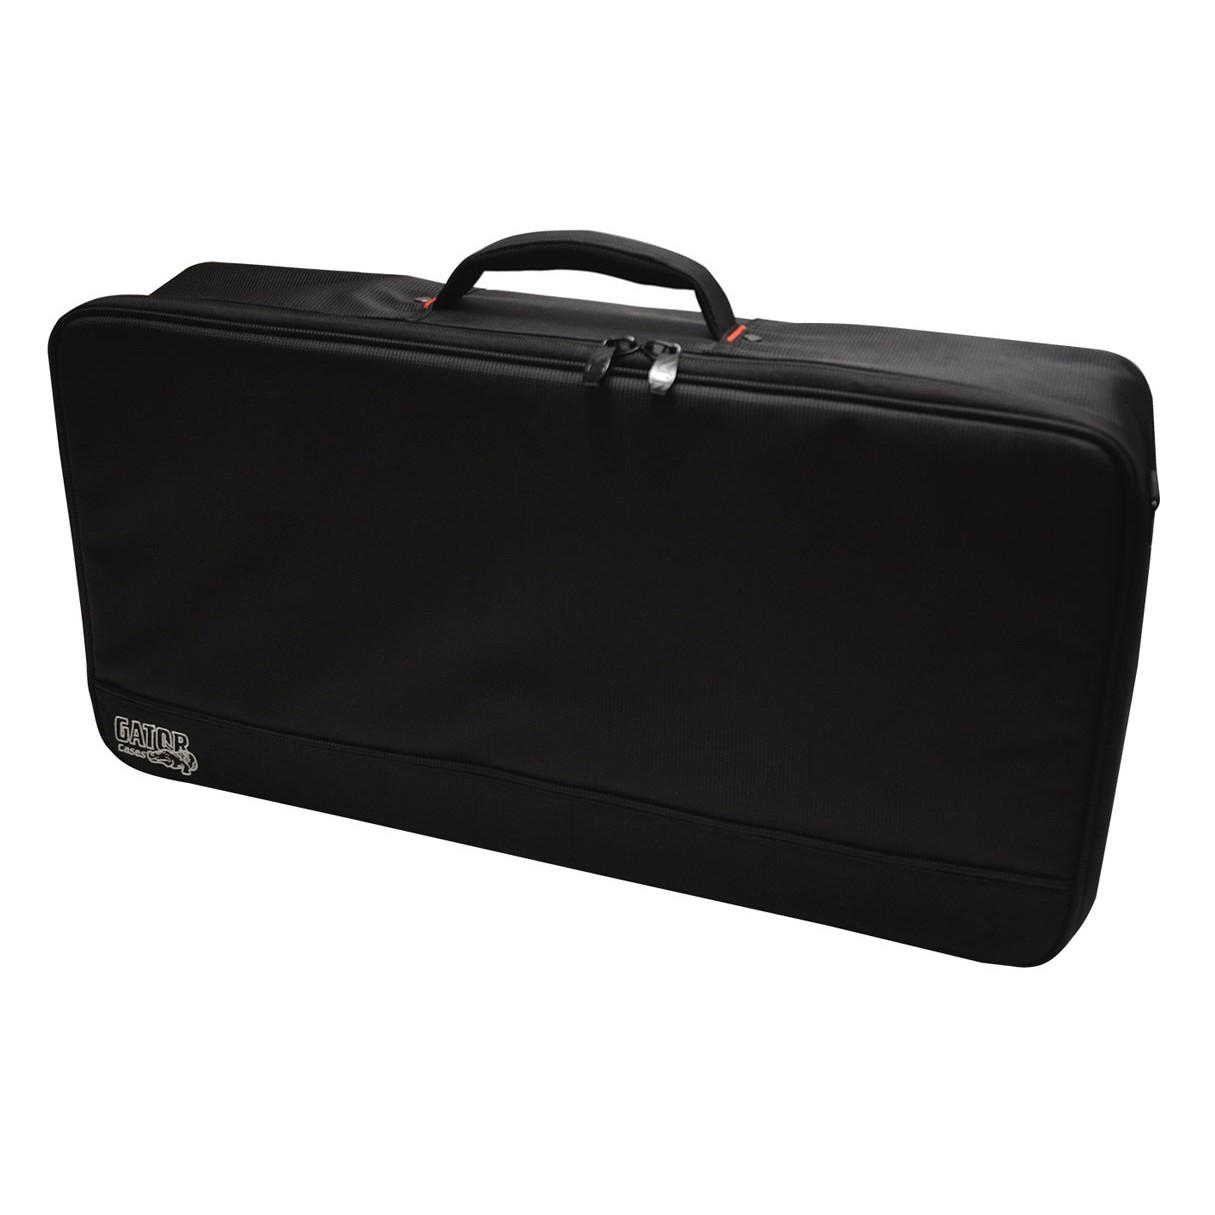 Gator Gpb Bak 1 Black Aluminum Pedal Board Large W Carry Bag